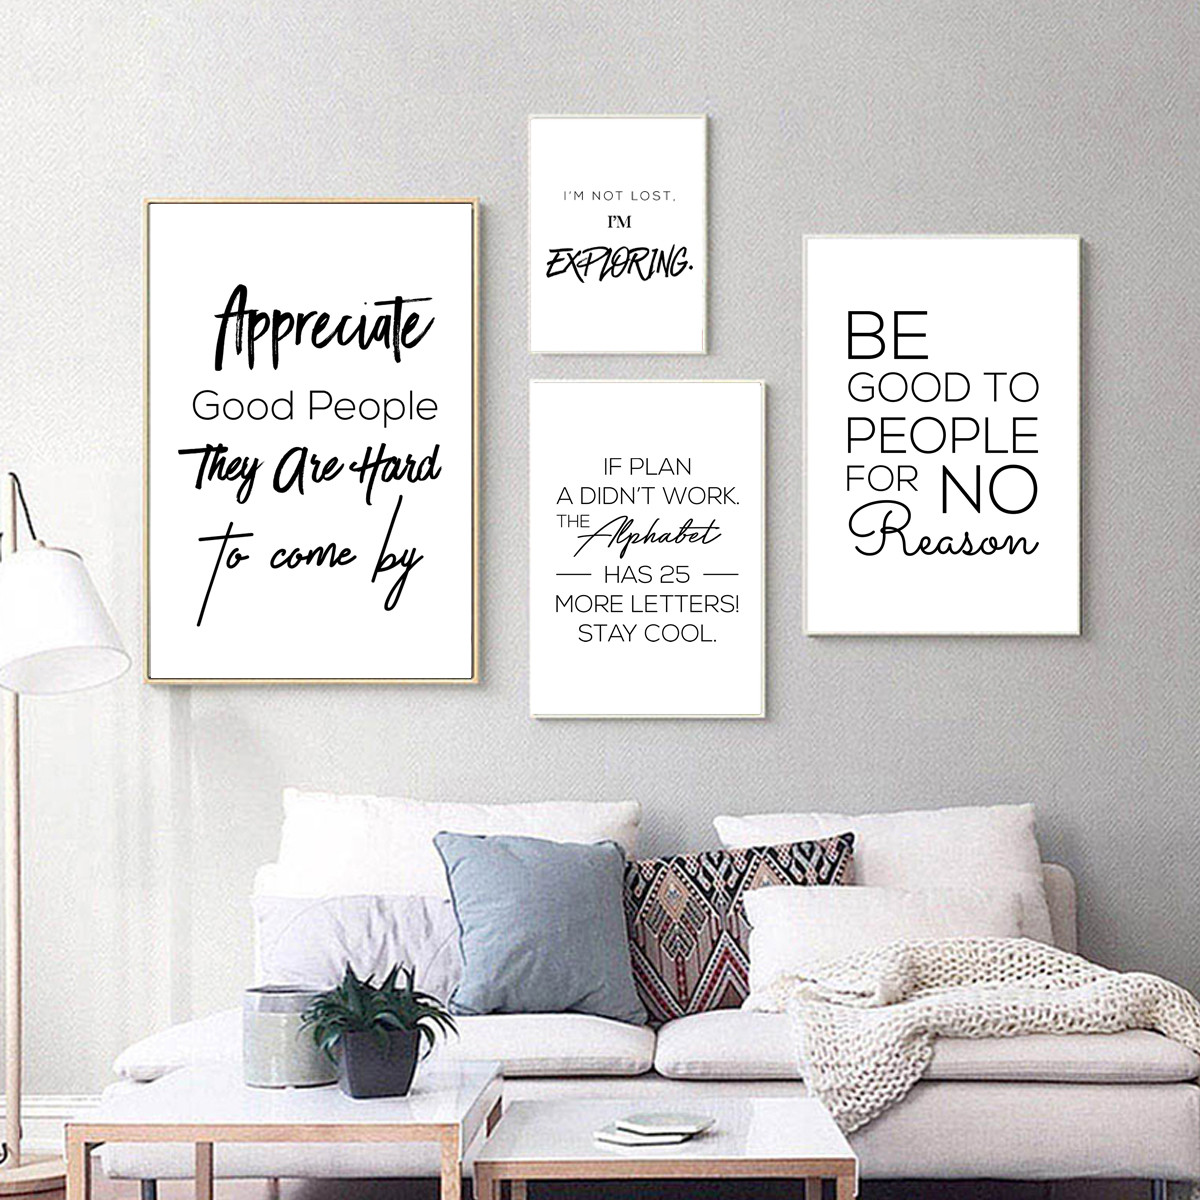 Minimalis Menginspirasi Kutipan Bahasa Inggris Gambar Poster Kanvas Cetak Lukisan Seni Dinding Ruang Tamu Dekorasi Rumah Painting & Calligraphy  - AliExpress